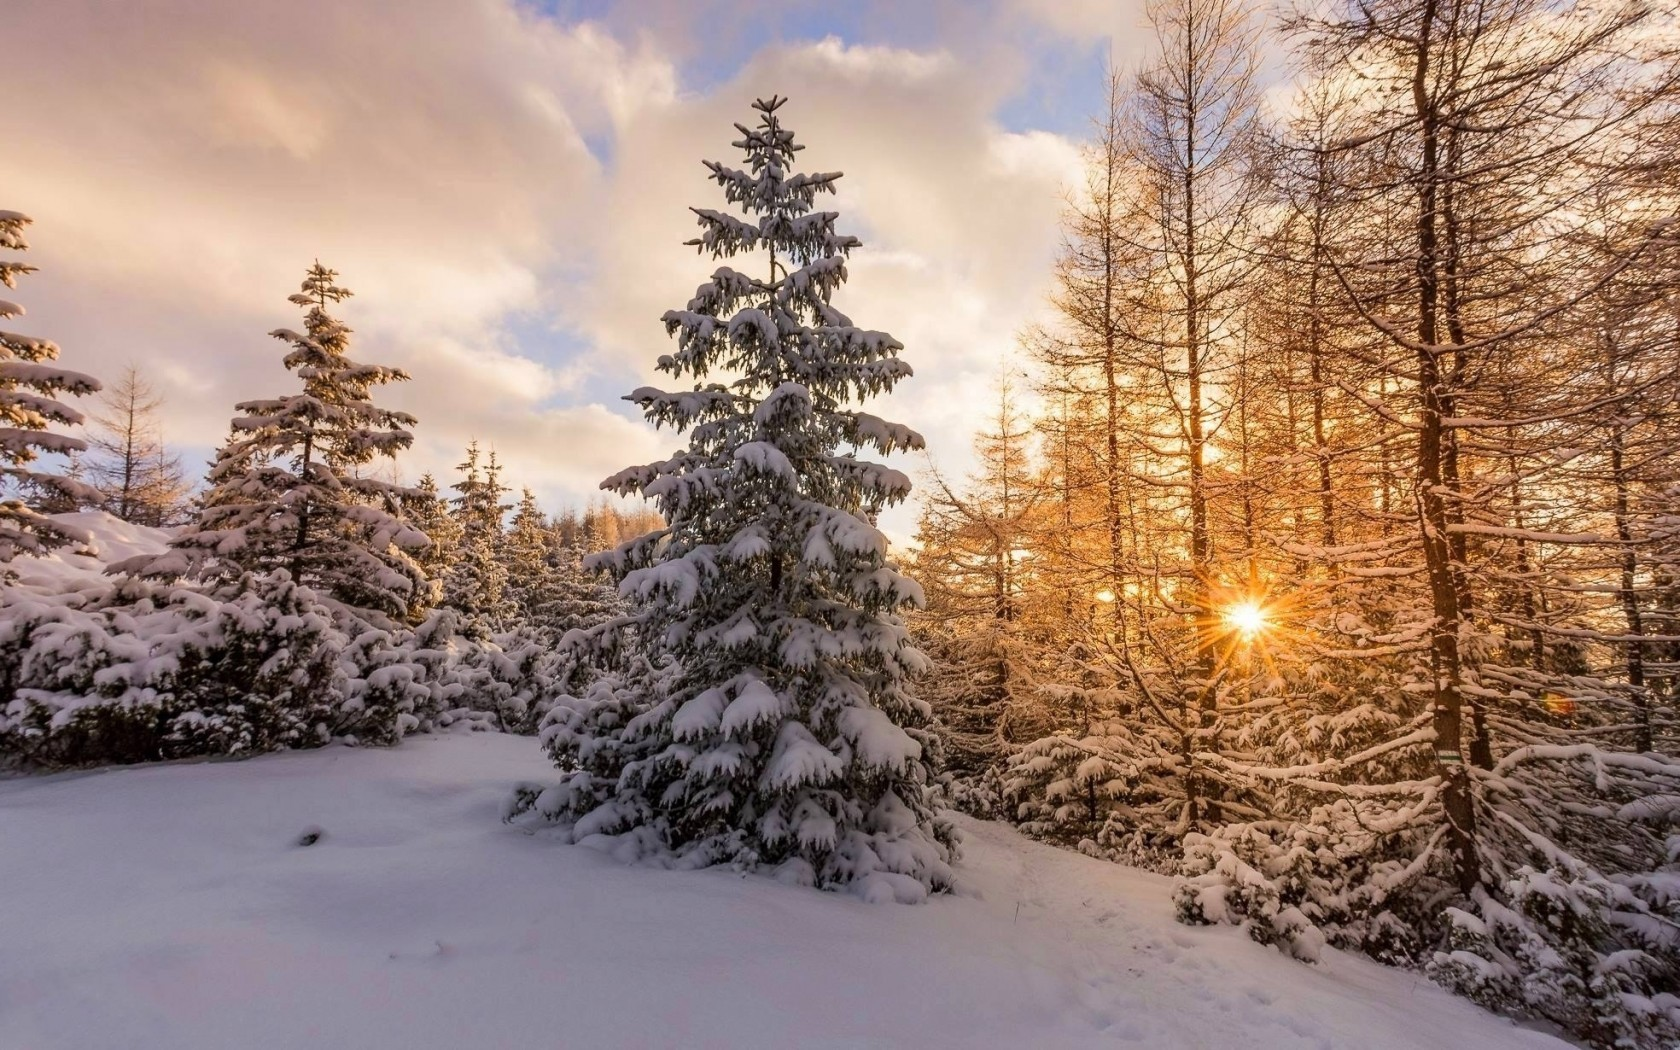 Snow, Winter, Sunset, Pine Tree - Winter Sunset Tree Snow - HD Wallpaper